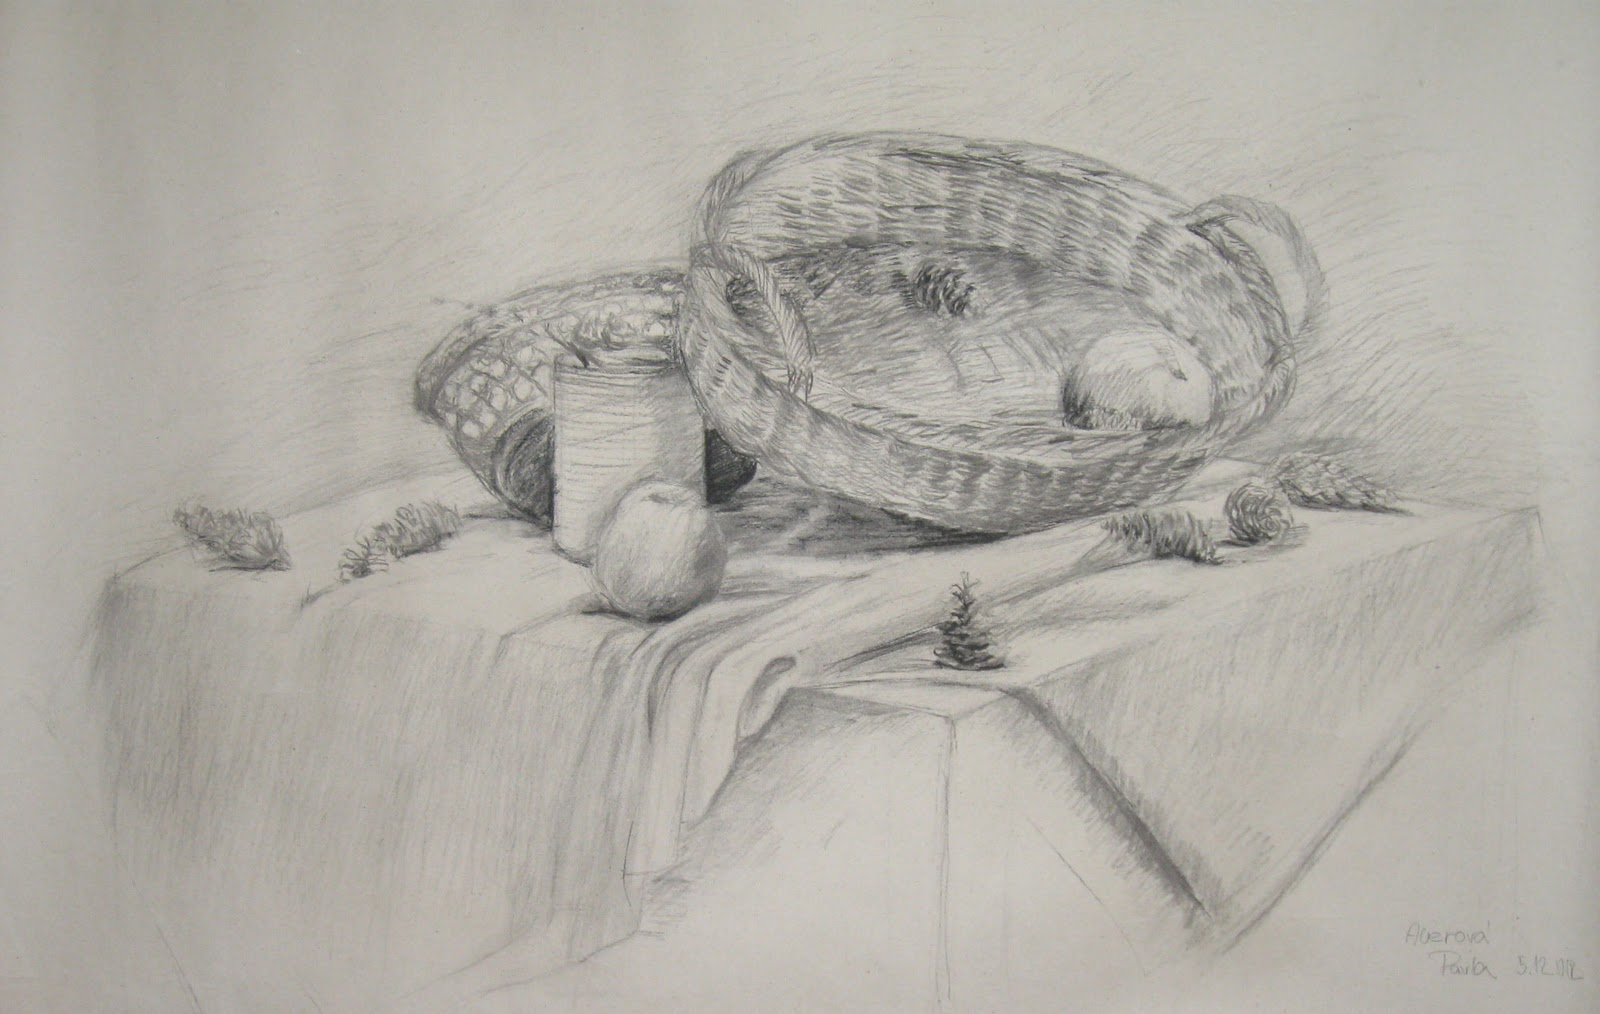 Aura Kresba Zatisi Uhel Drawing By Charcoal